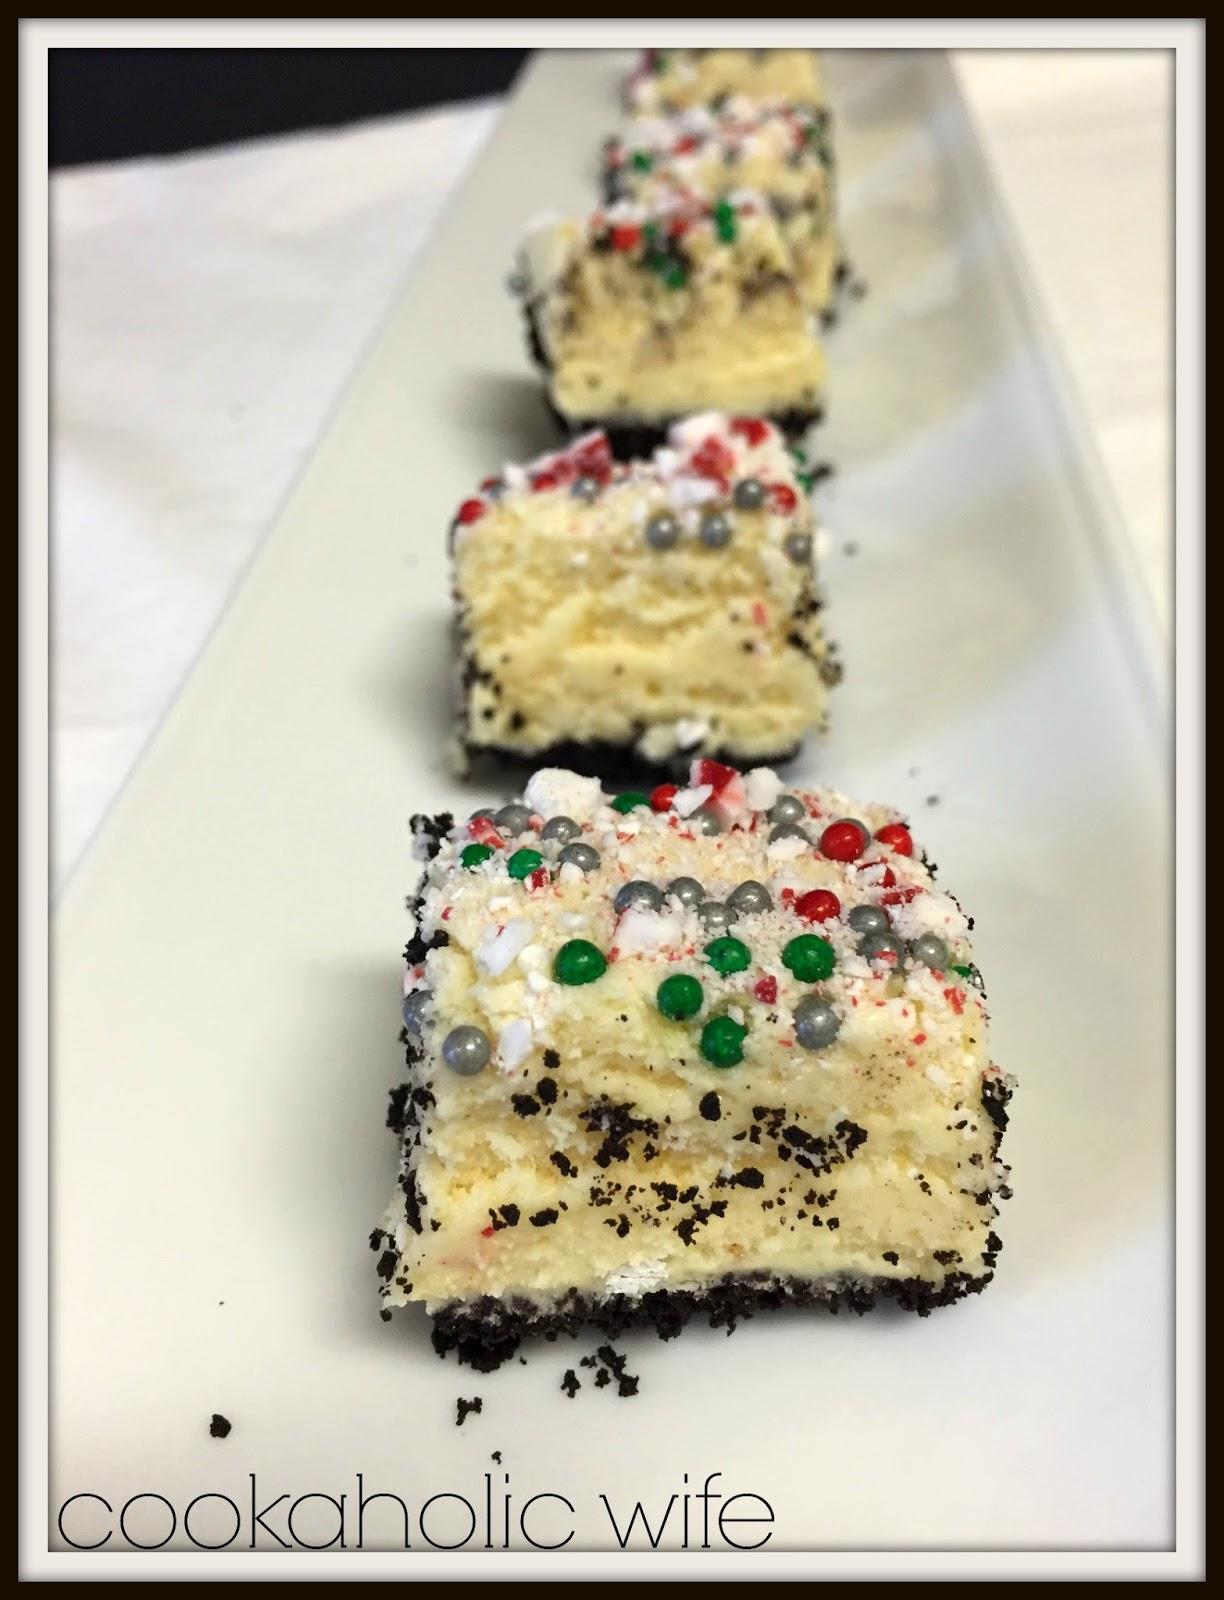 Cookaholic Wife: Vanilla Peppermint Fudge